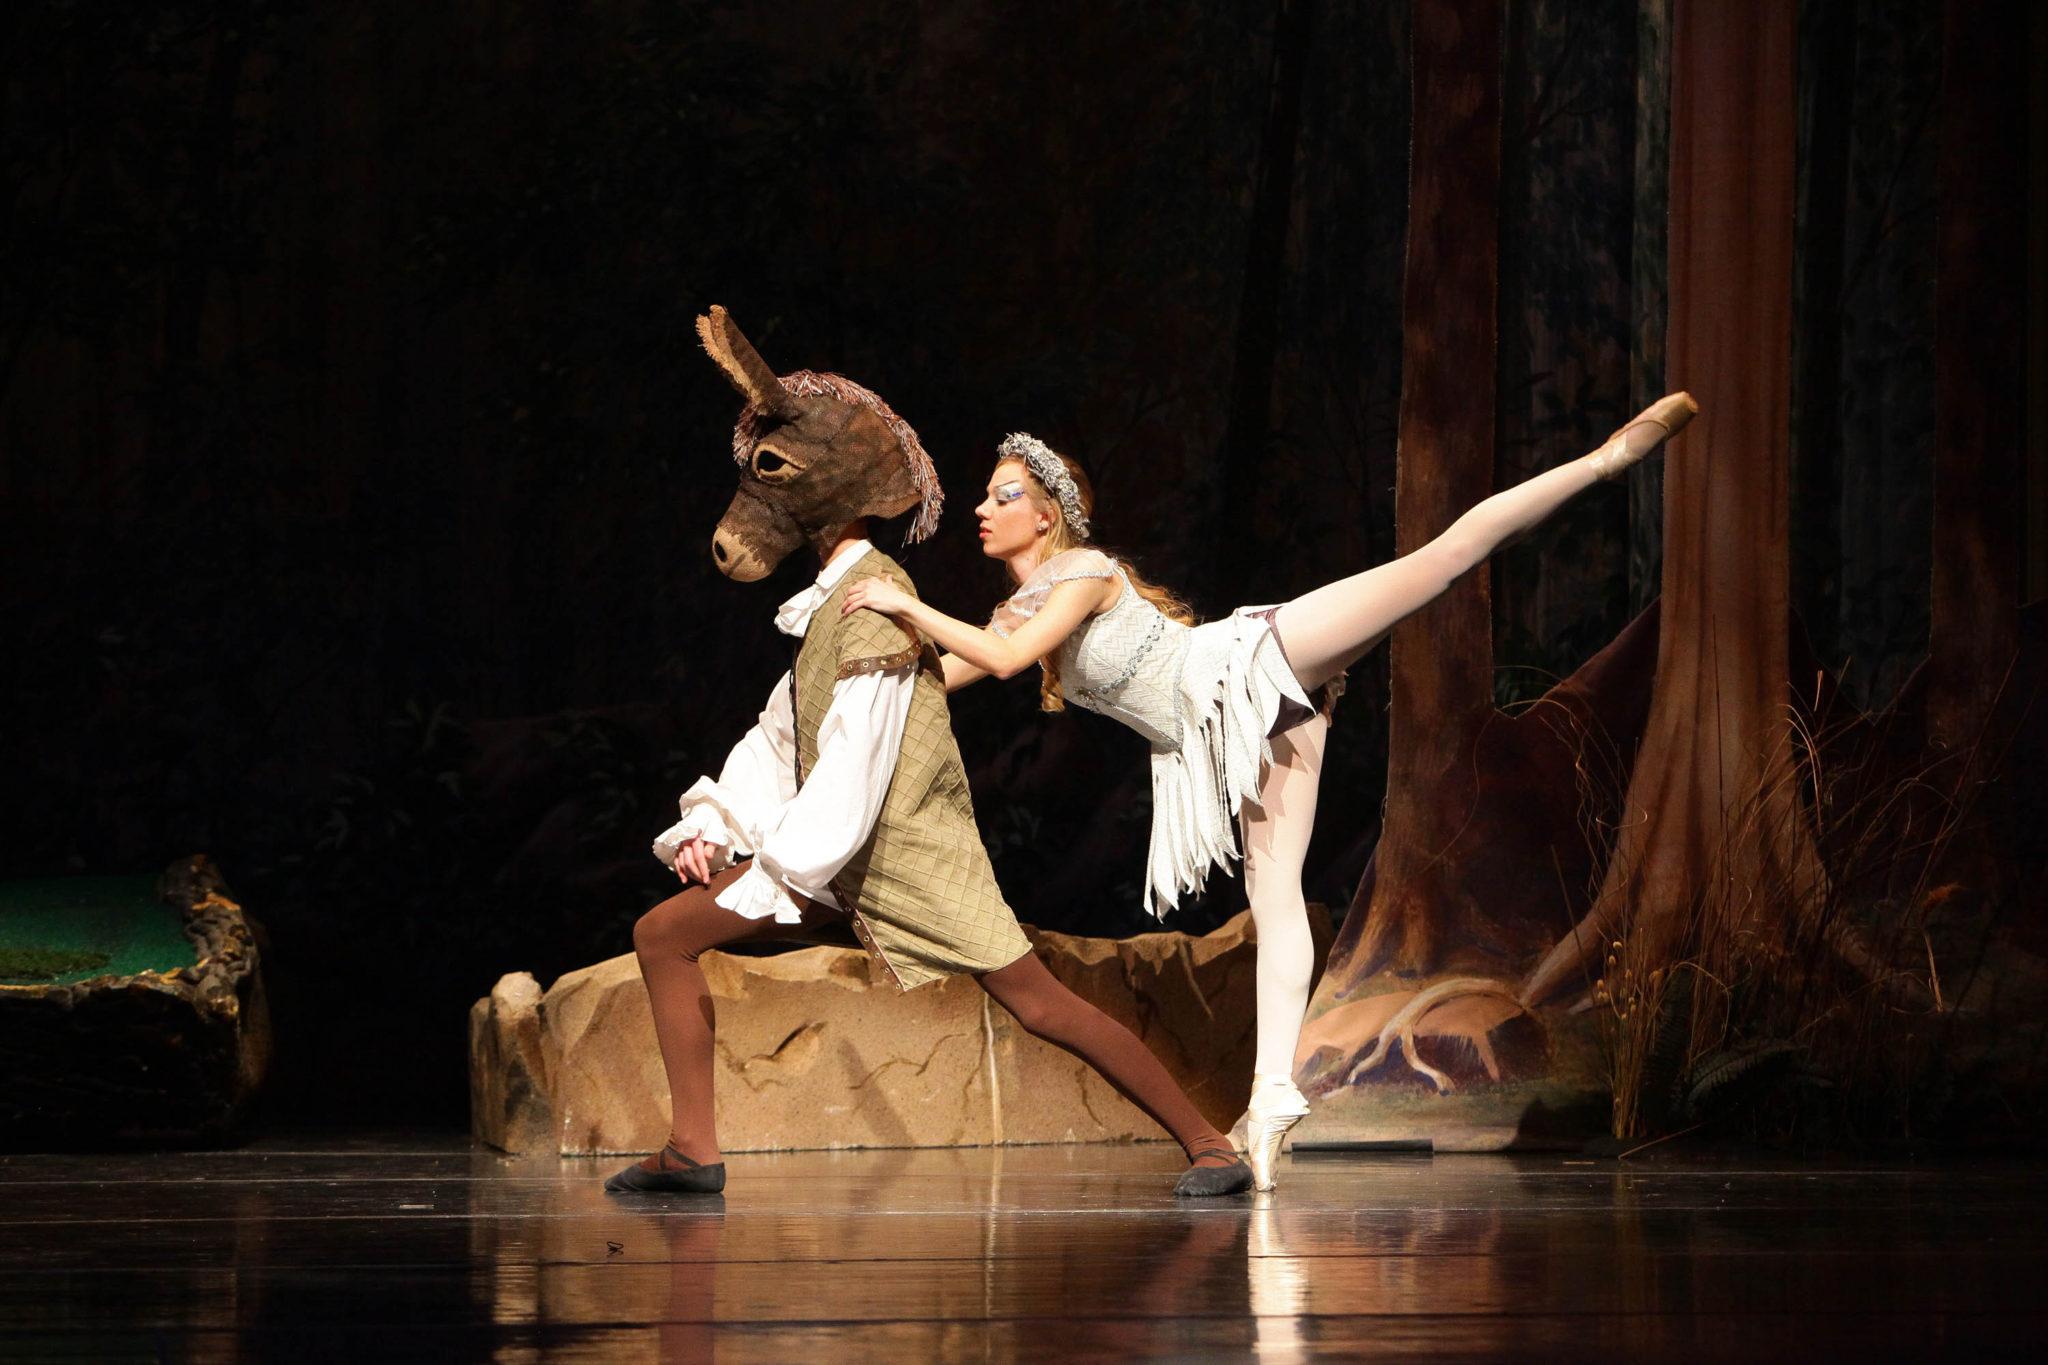 d1ee09181 CARE Ballet - Grand Rapids Non-Profit Ballet Company and Dance School